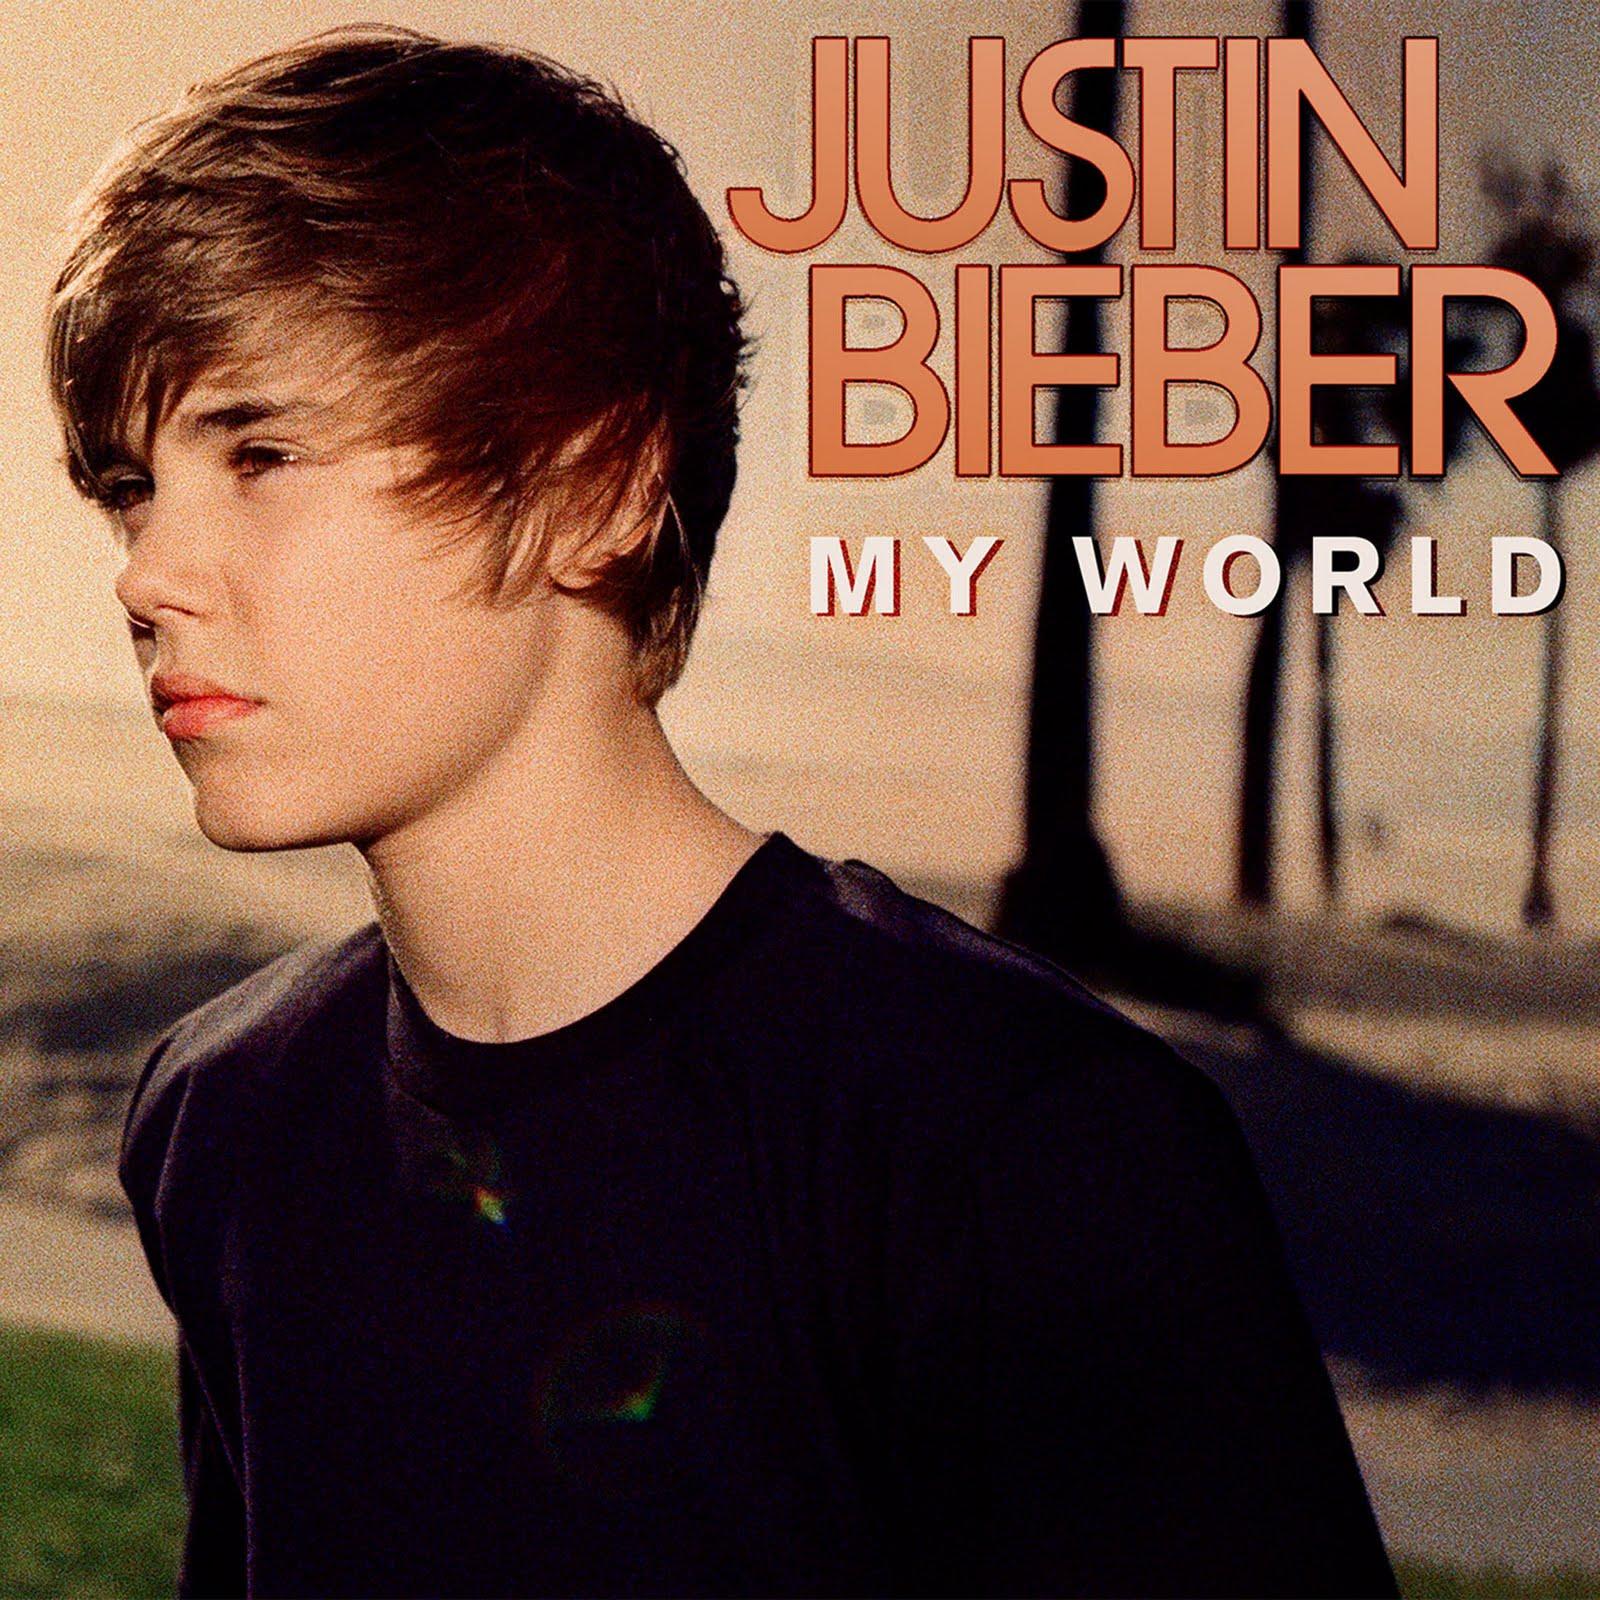 My World (EP)